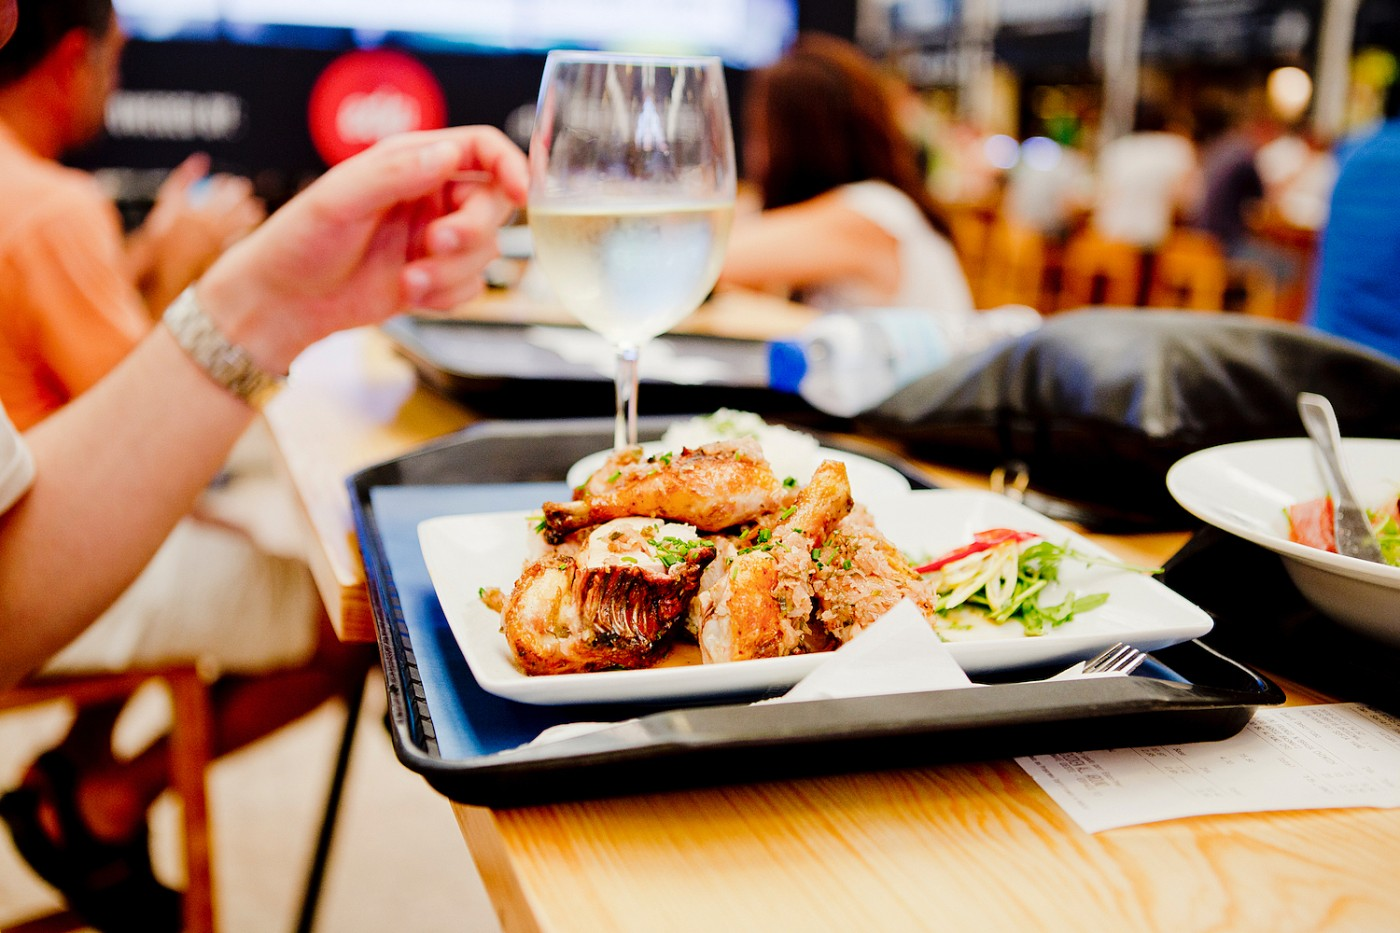 Mercado da Ribeira |where to eat in lisbon _ lisbon food guide _ lisbon food recommendation